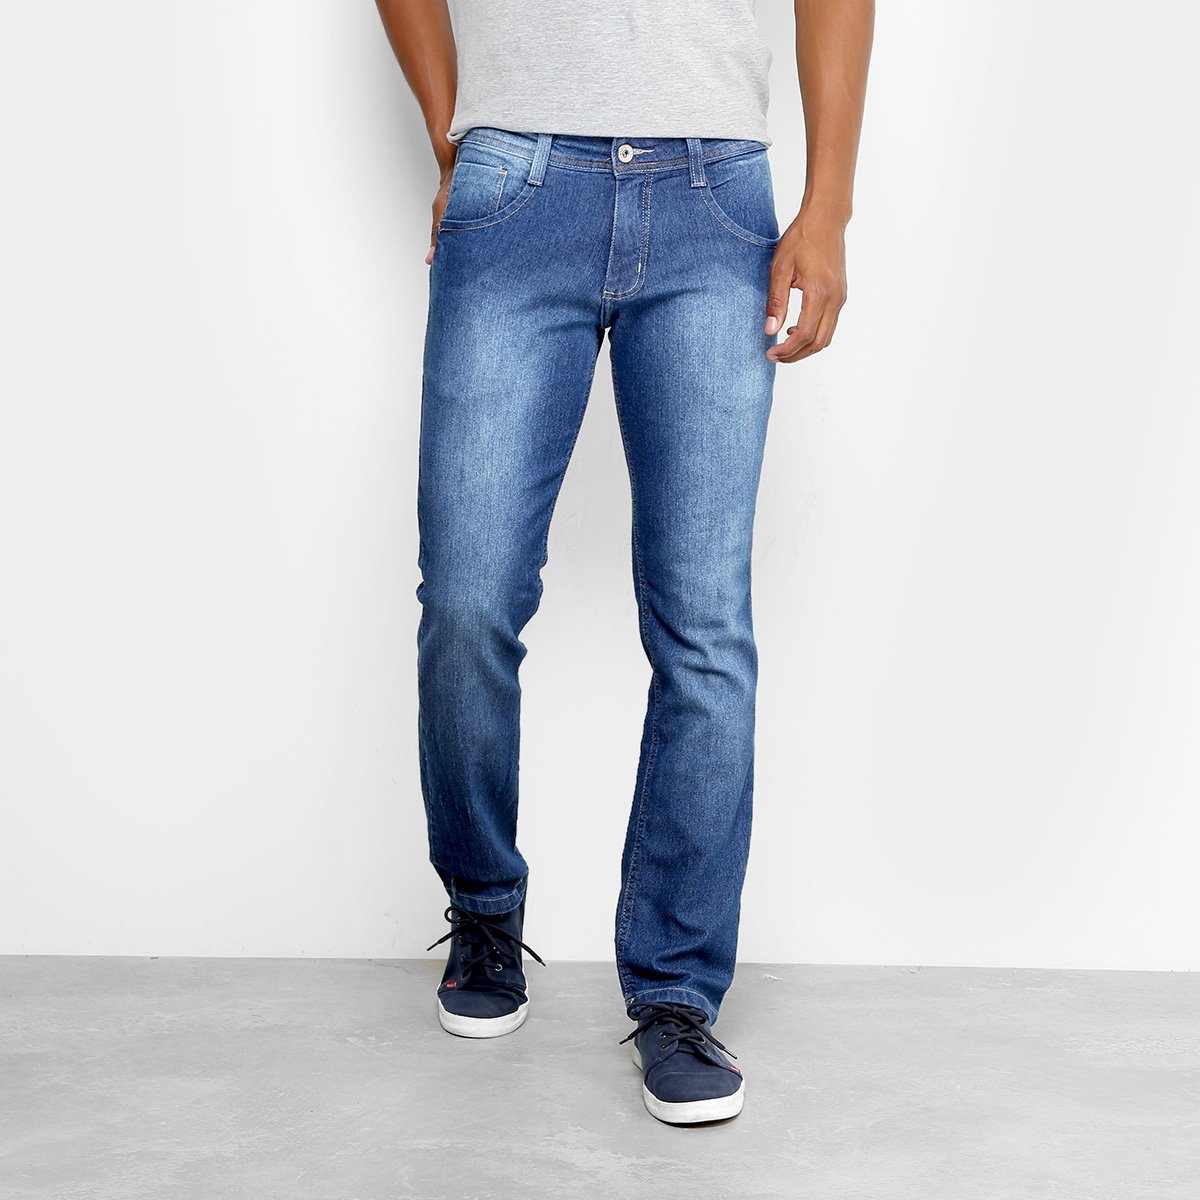 Calça Jeans Slim Biotipo Soft Estonada Masculina. undefined e3797438b08